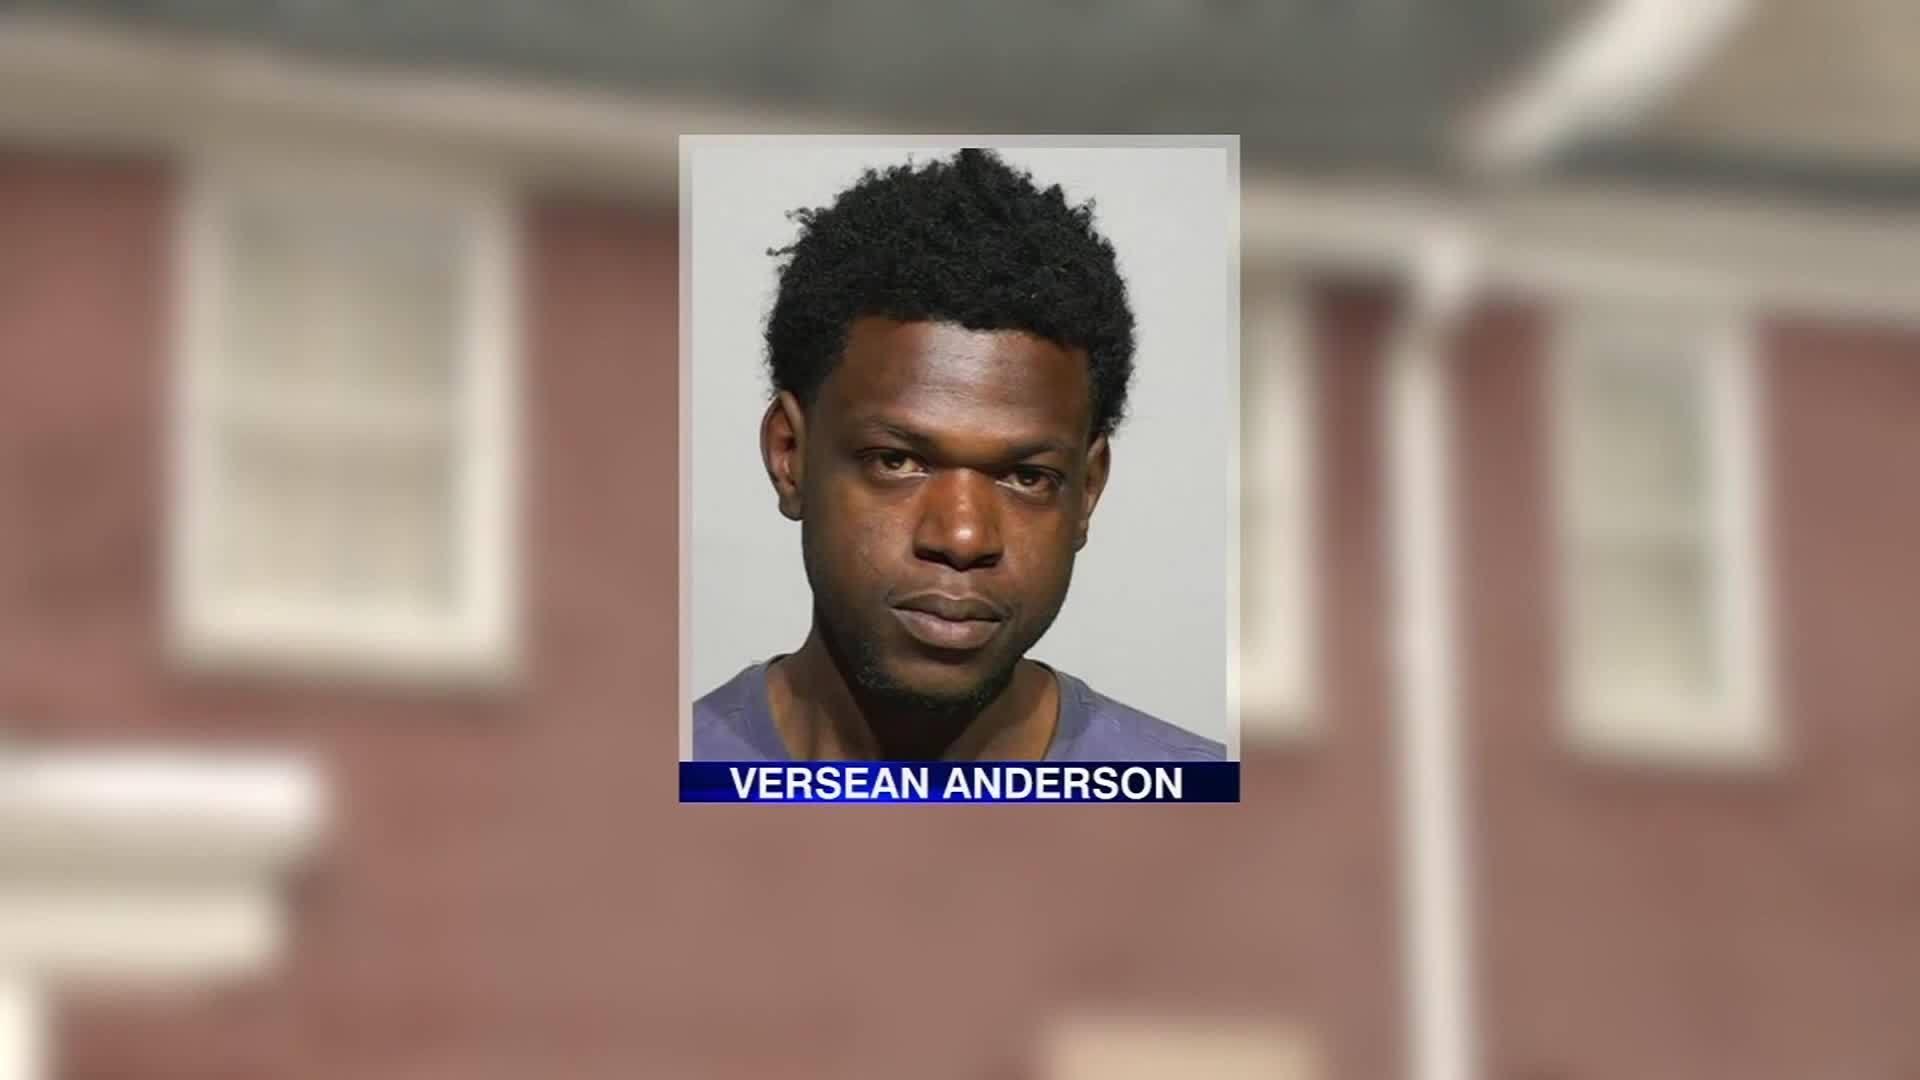 5-week-old baby overdoses, man arrested